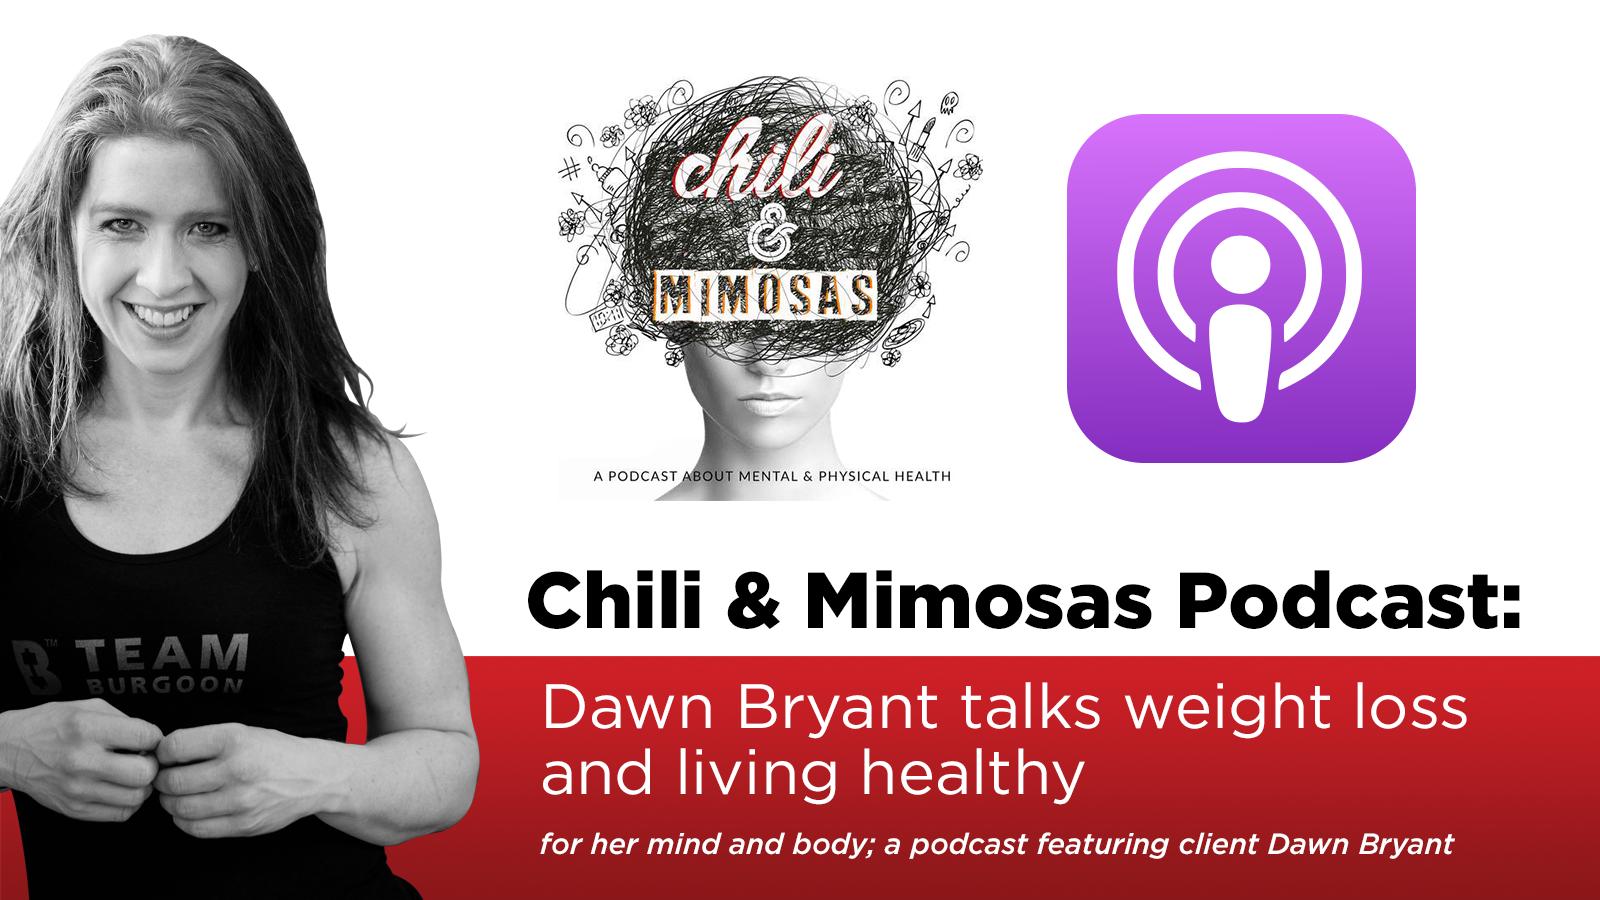 2018-10-01: Chili & Mimosas Podacast